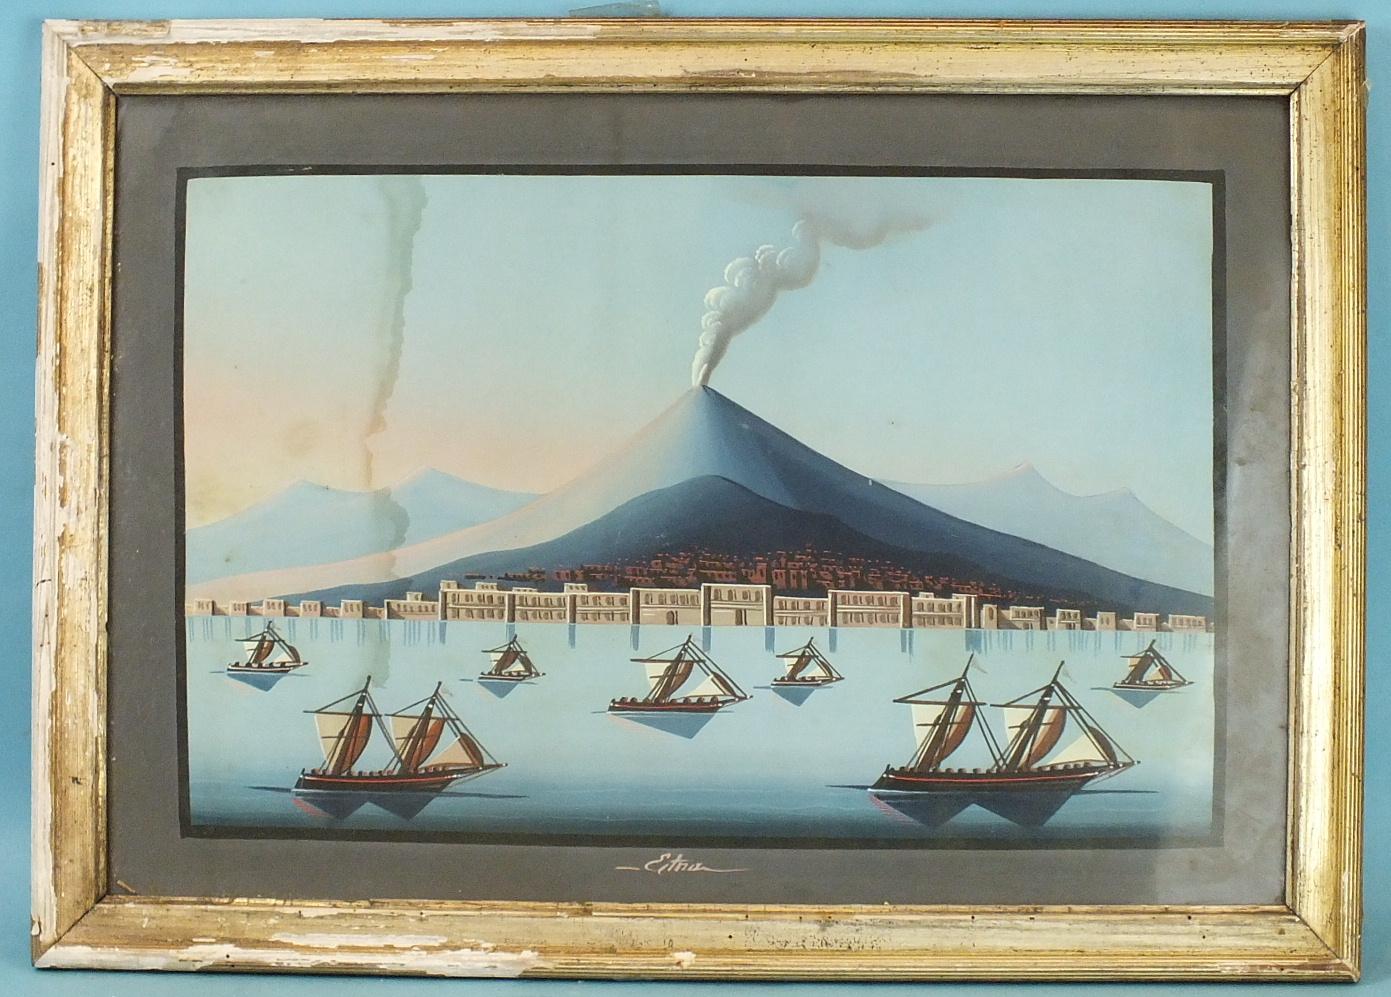 Lot 35 - Naïve Neapolitan School MOUNT ETNA ERUPTING Unsigned gouache, dated 1871 and a companion, MOUNT ETNA